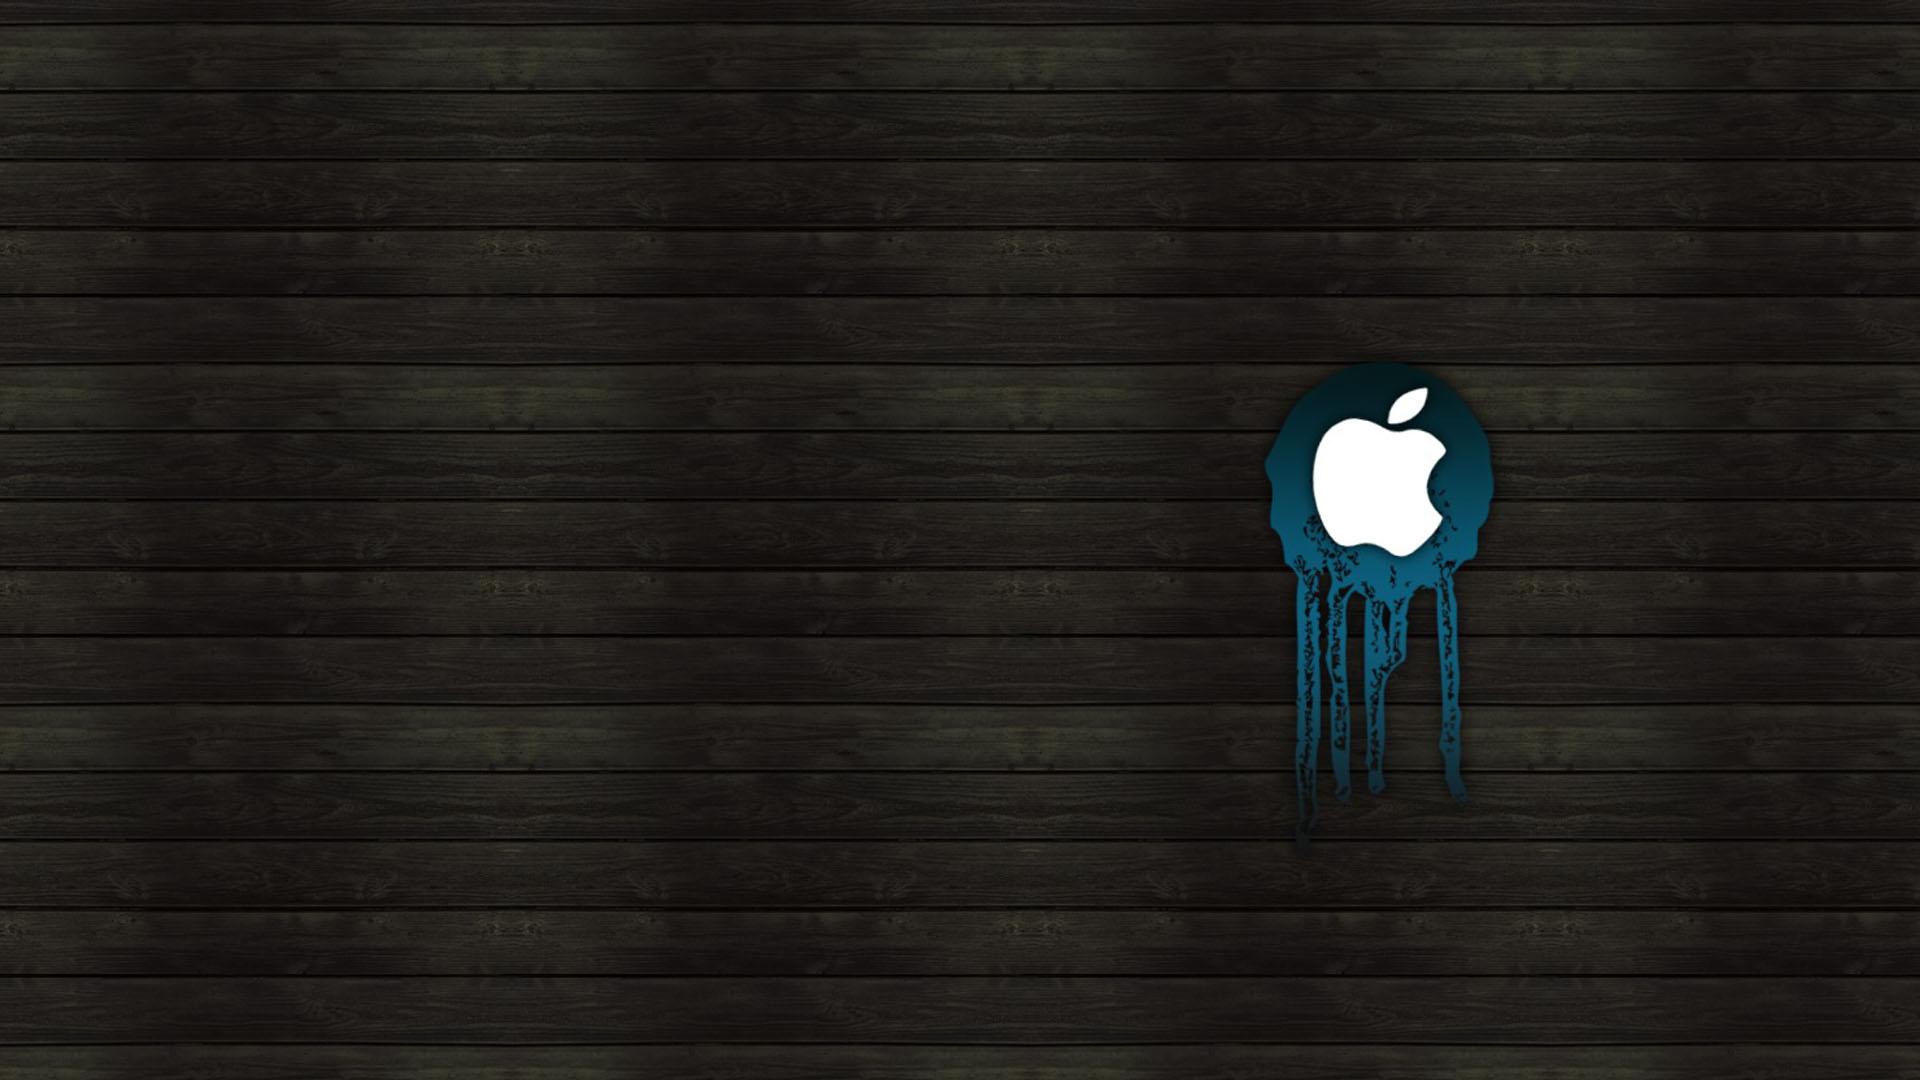 best macbook pro wallpaper hd 1920x1080